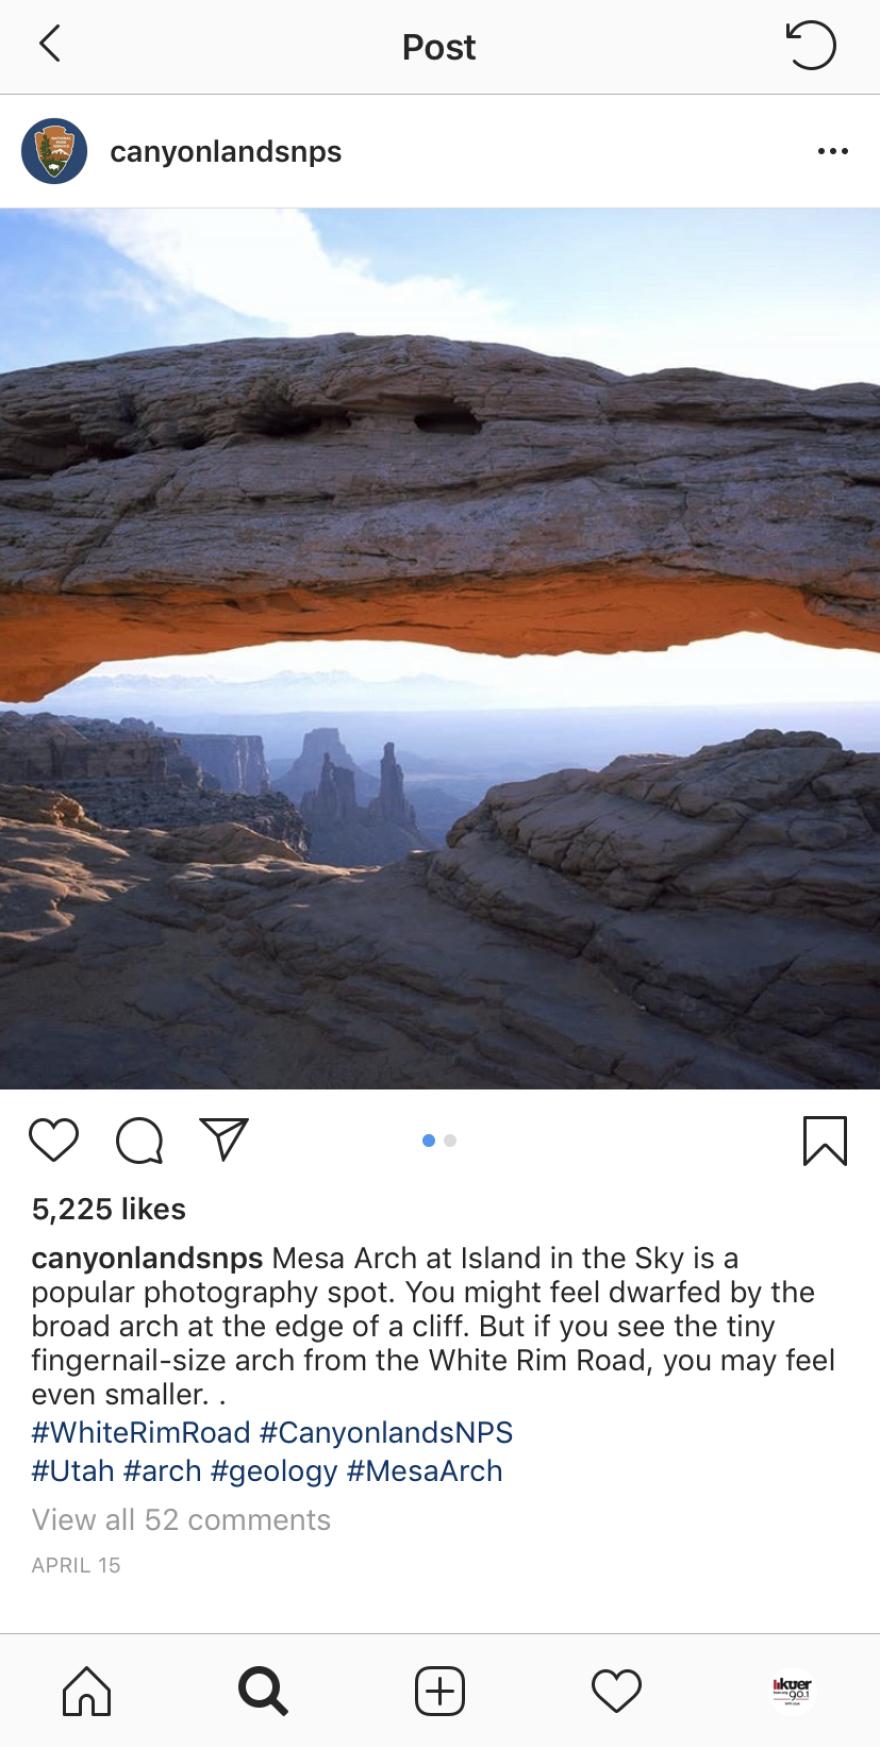 mesa_arch_canyonlands_nps_instagram_screenshot.png